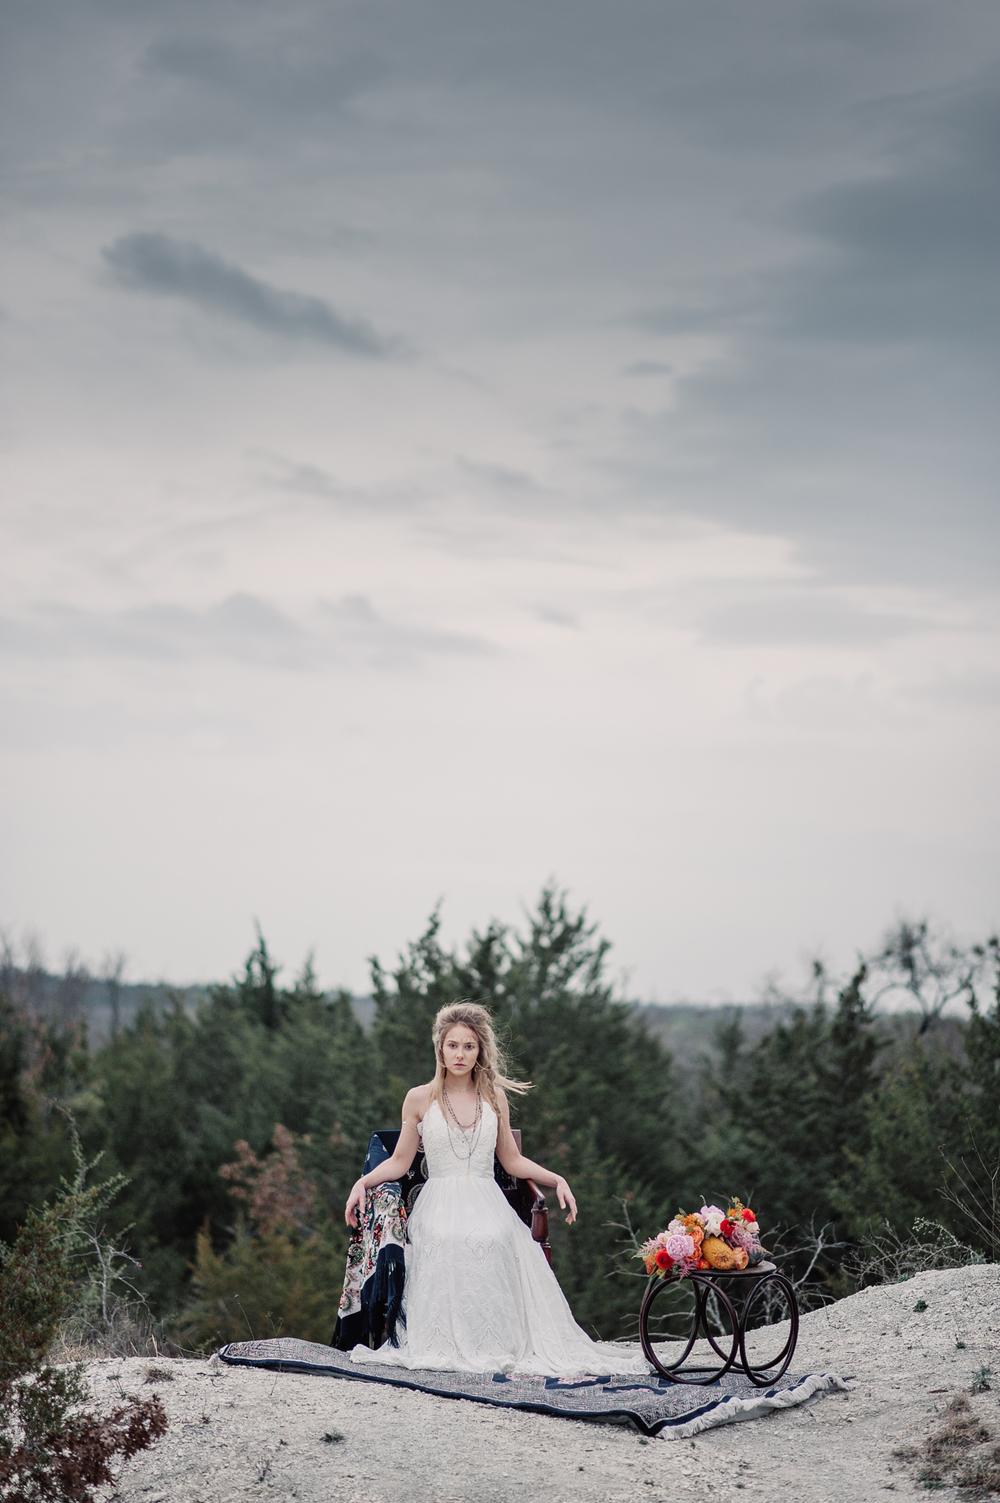 Bride-500.jpg